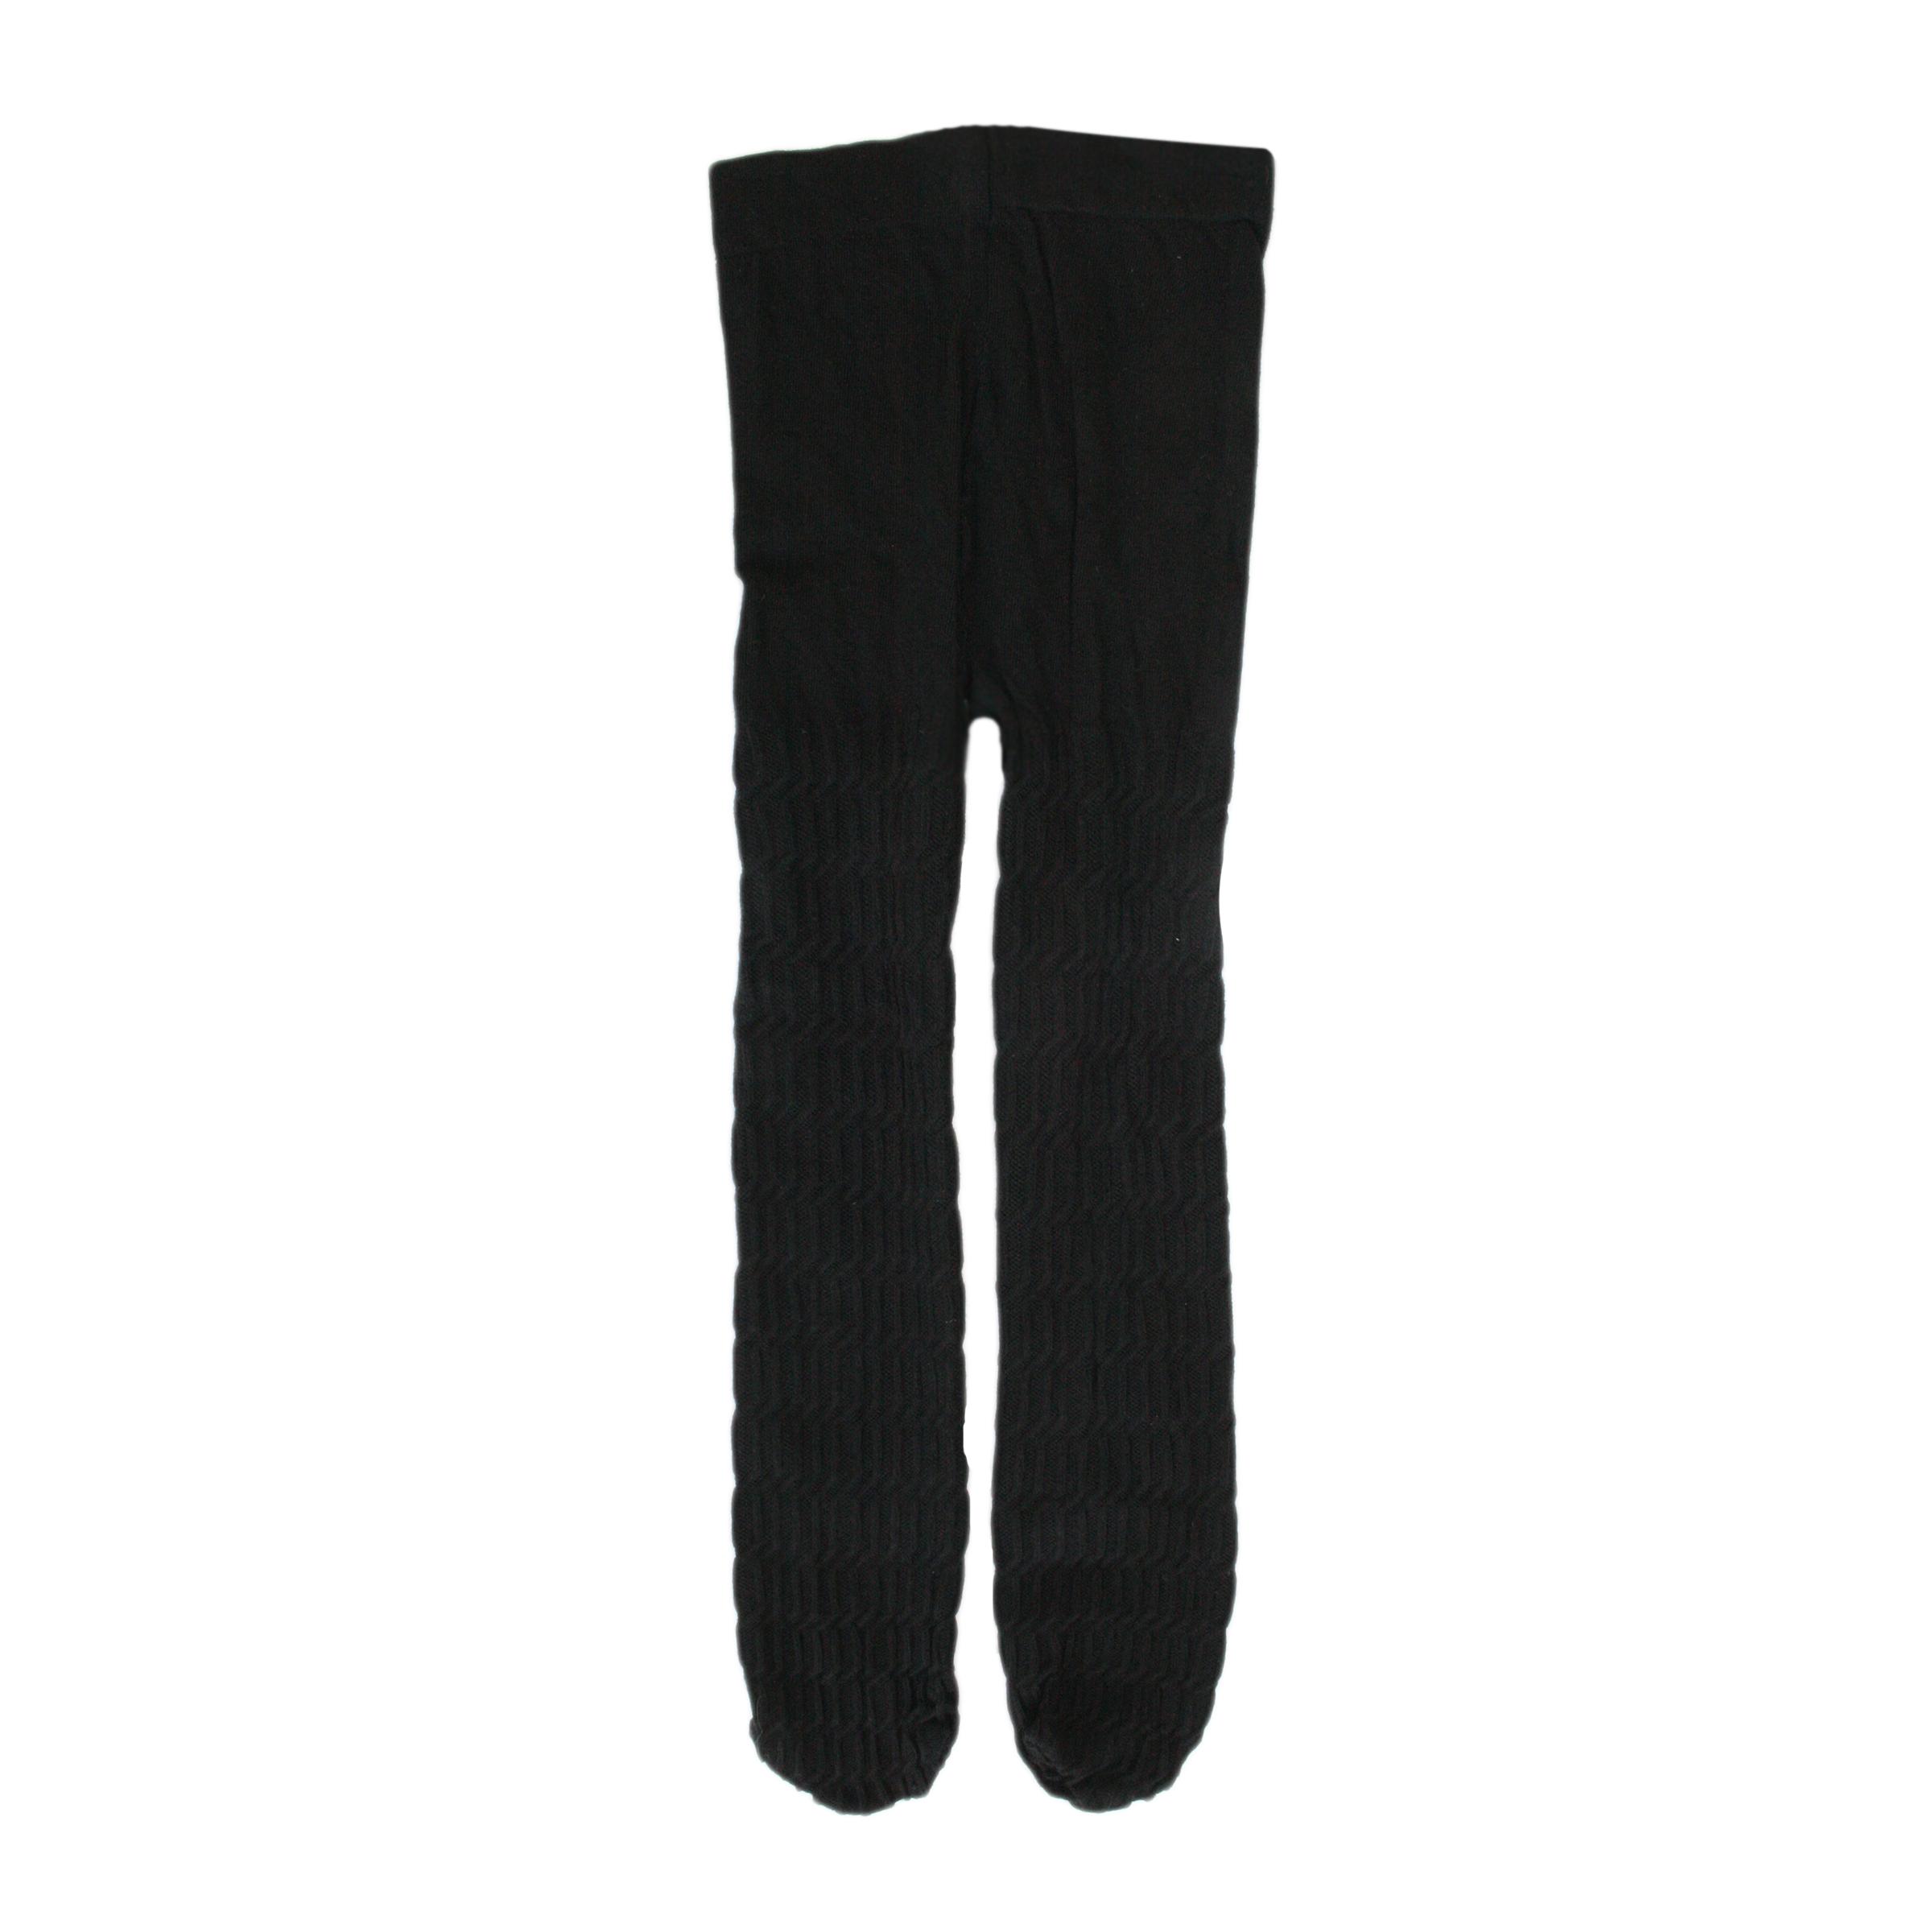 جوراب شلواری دخترانه کد 45 رنگ مشکی